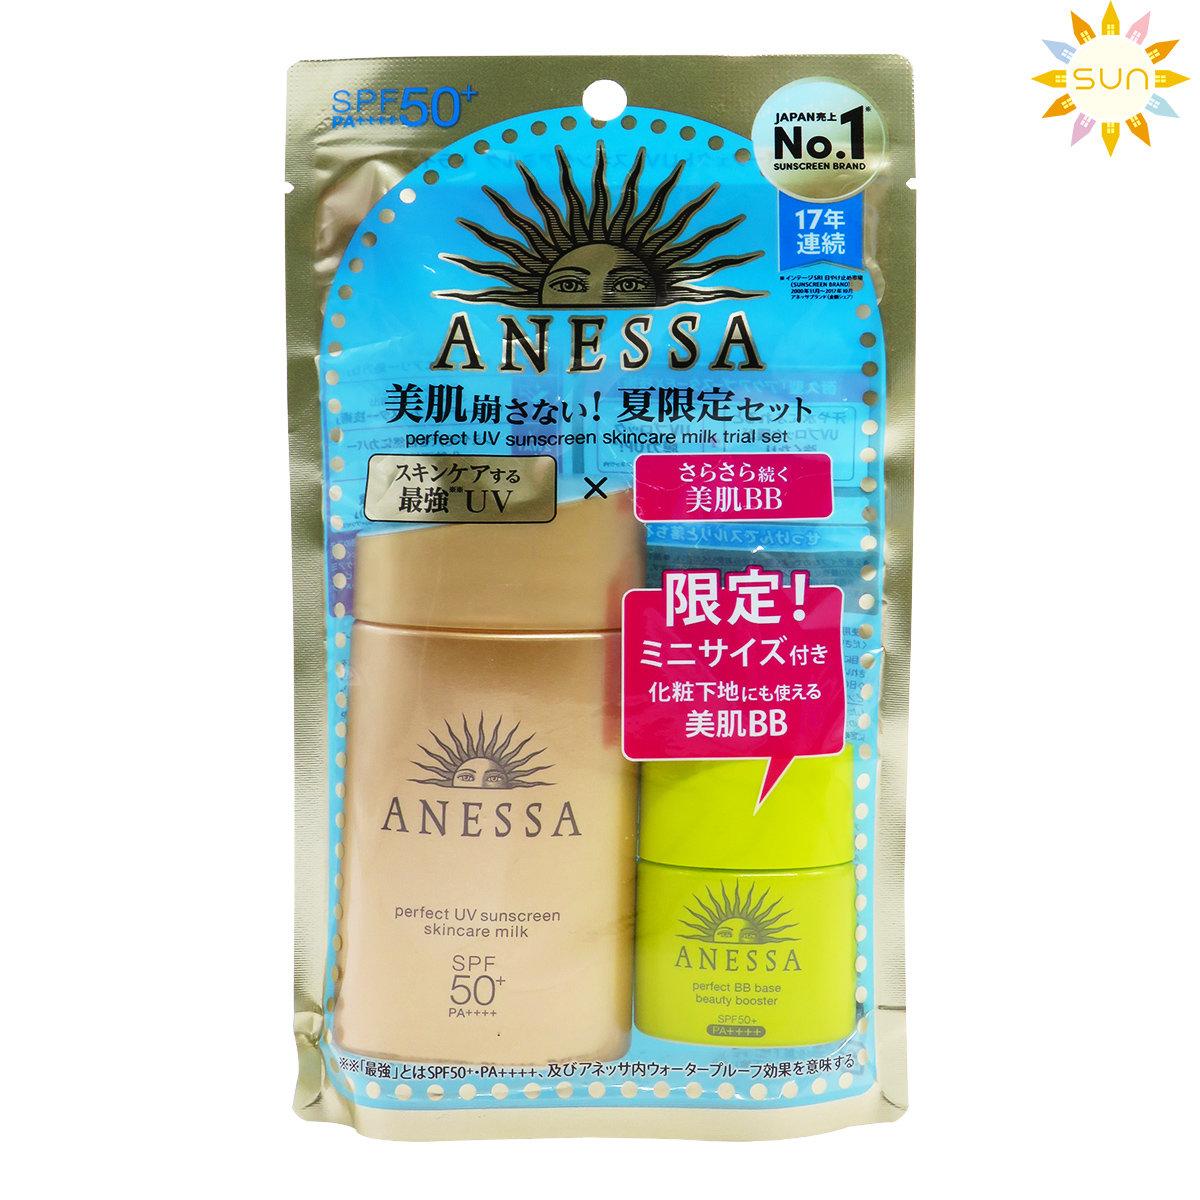 perfect UV sunscreen skincare milk trial set (60ml + 7.5ml)